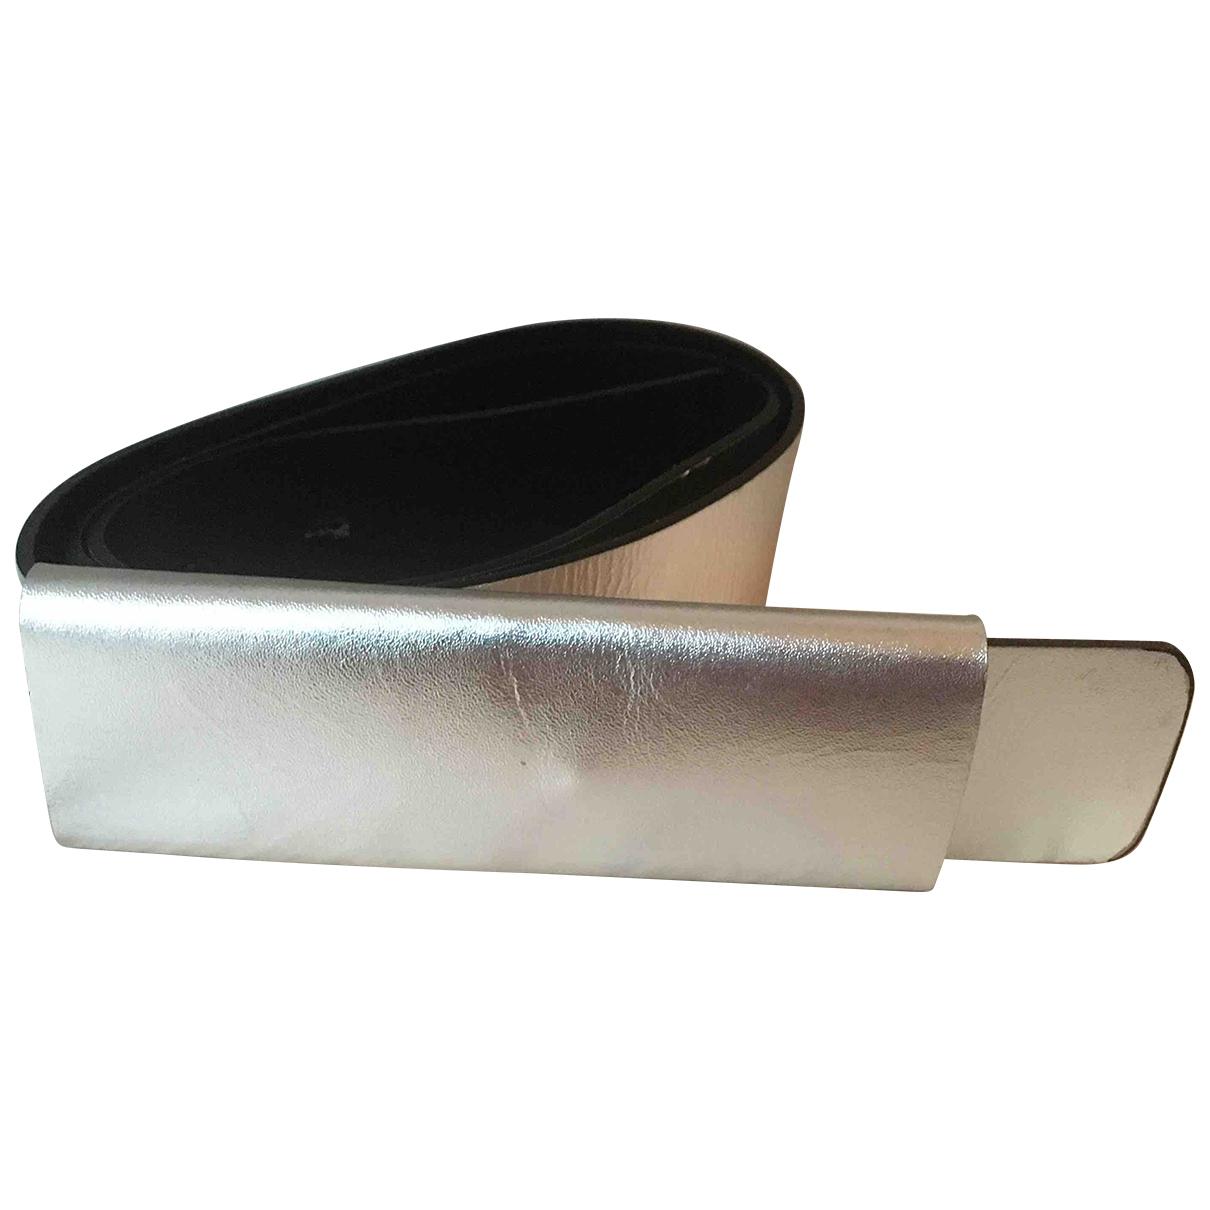 Naja Lauf \N Silver Leather belt for Women M International